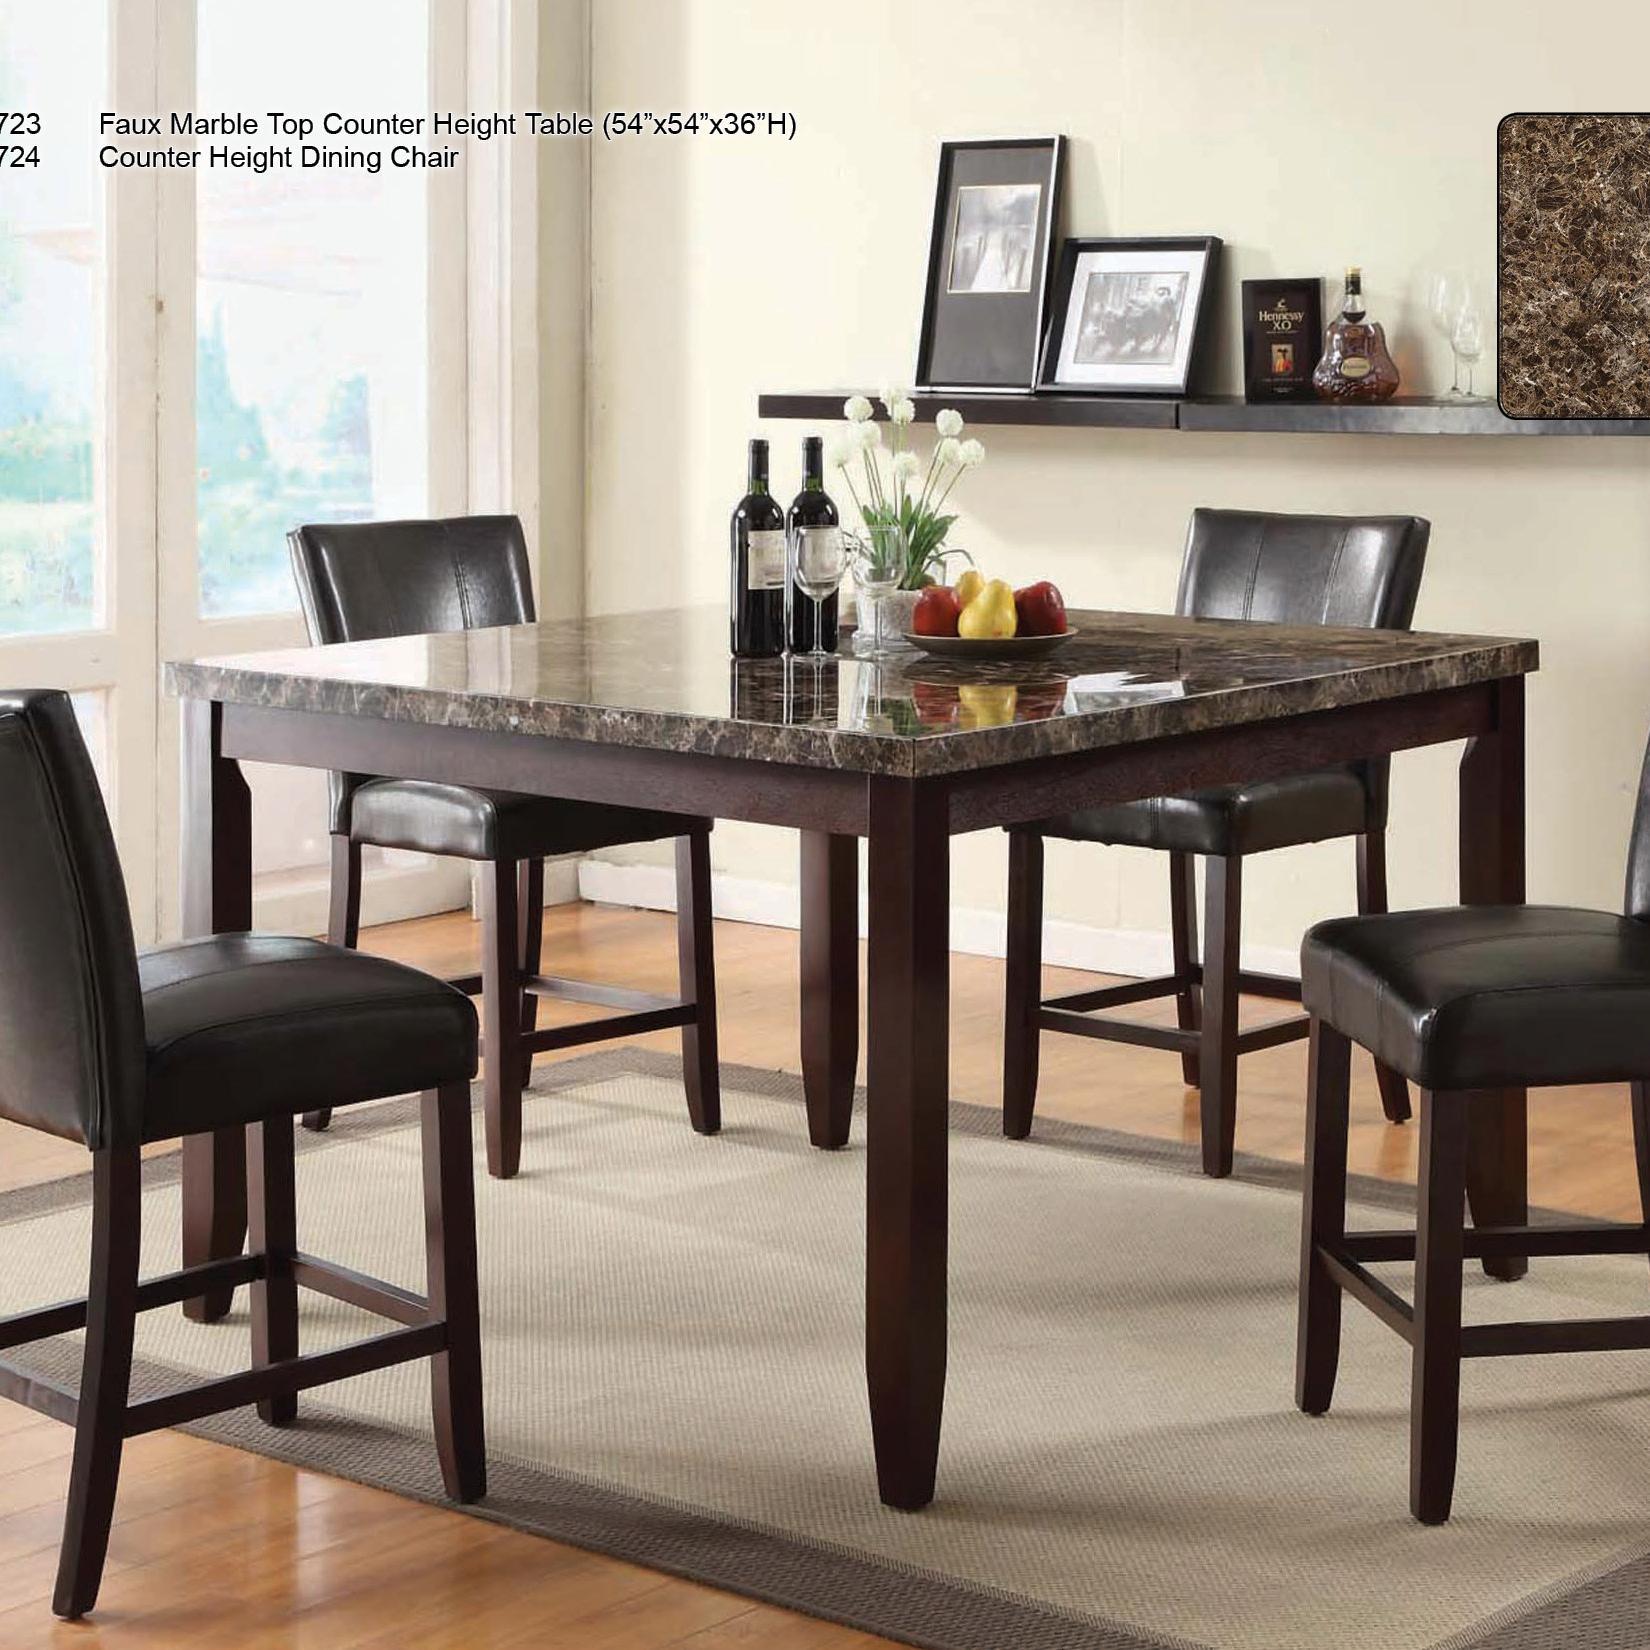 U S Furniture Inc 2720 Dinette Transitional Five Piece